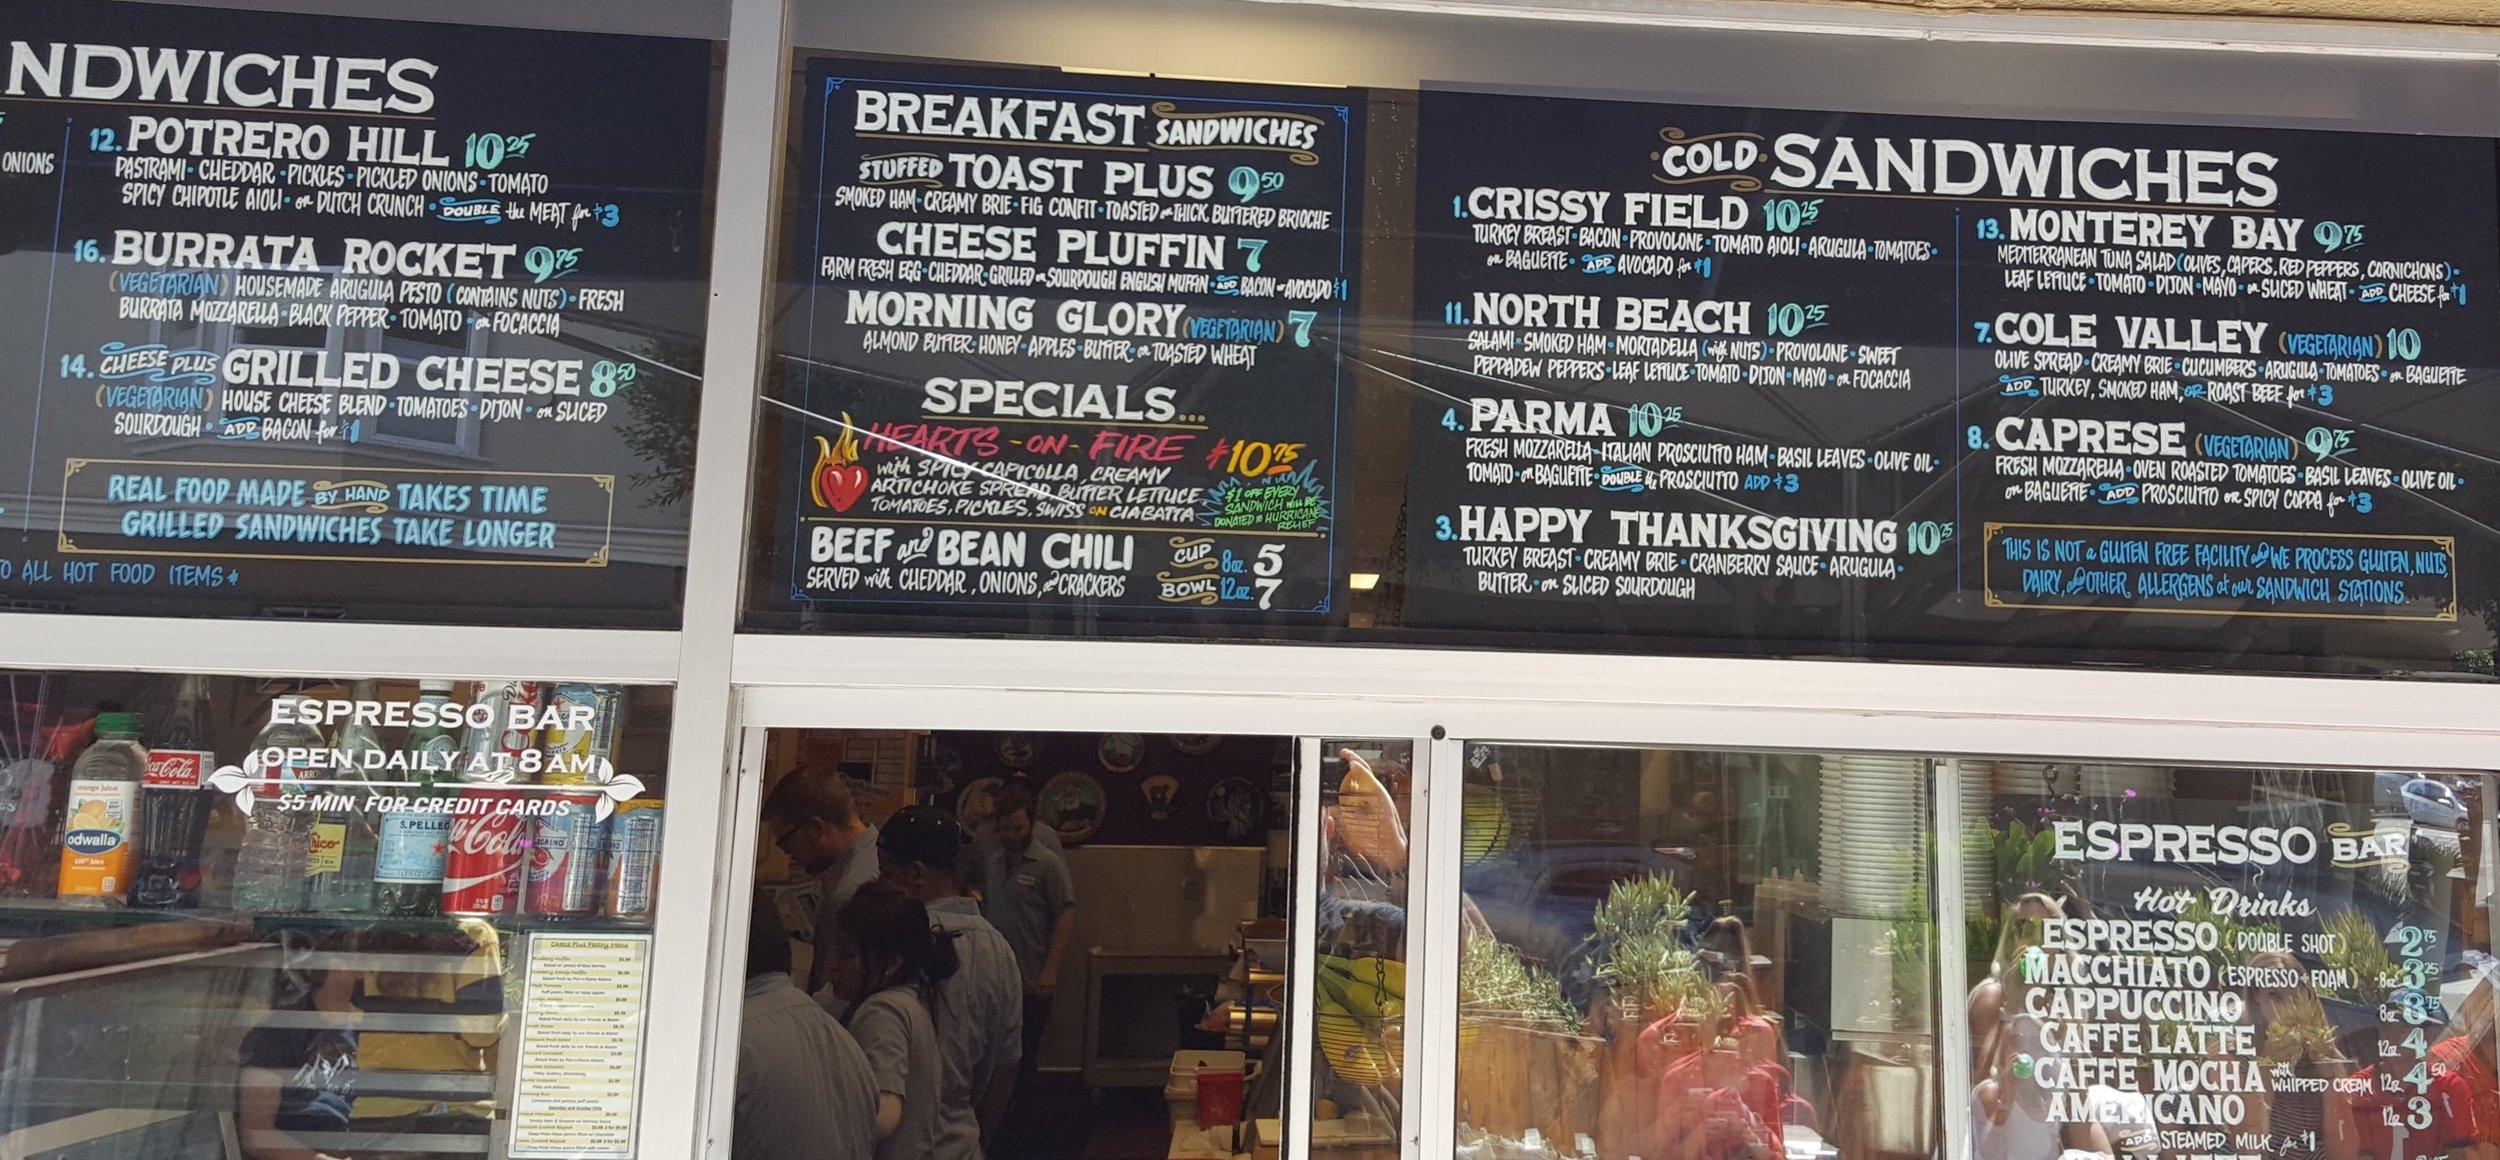 The sandwich menu at the sidewalk cafe.